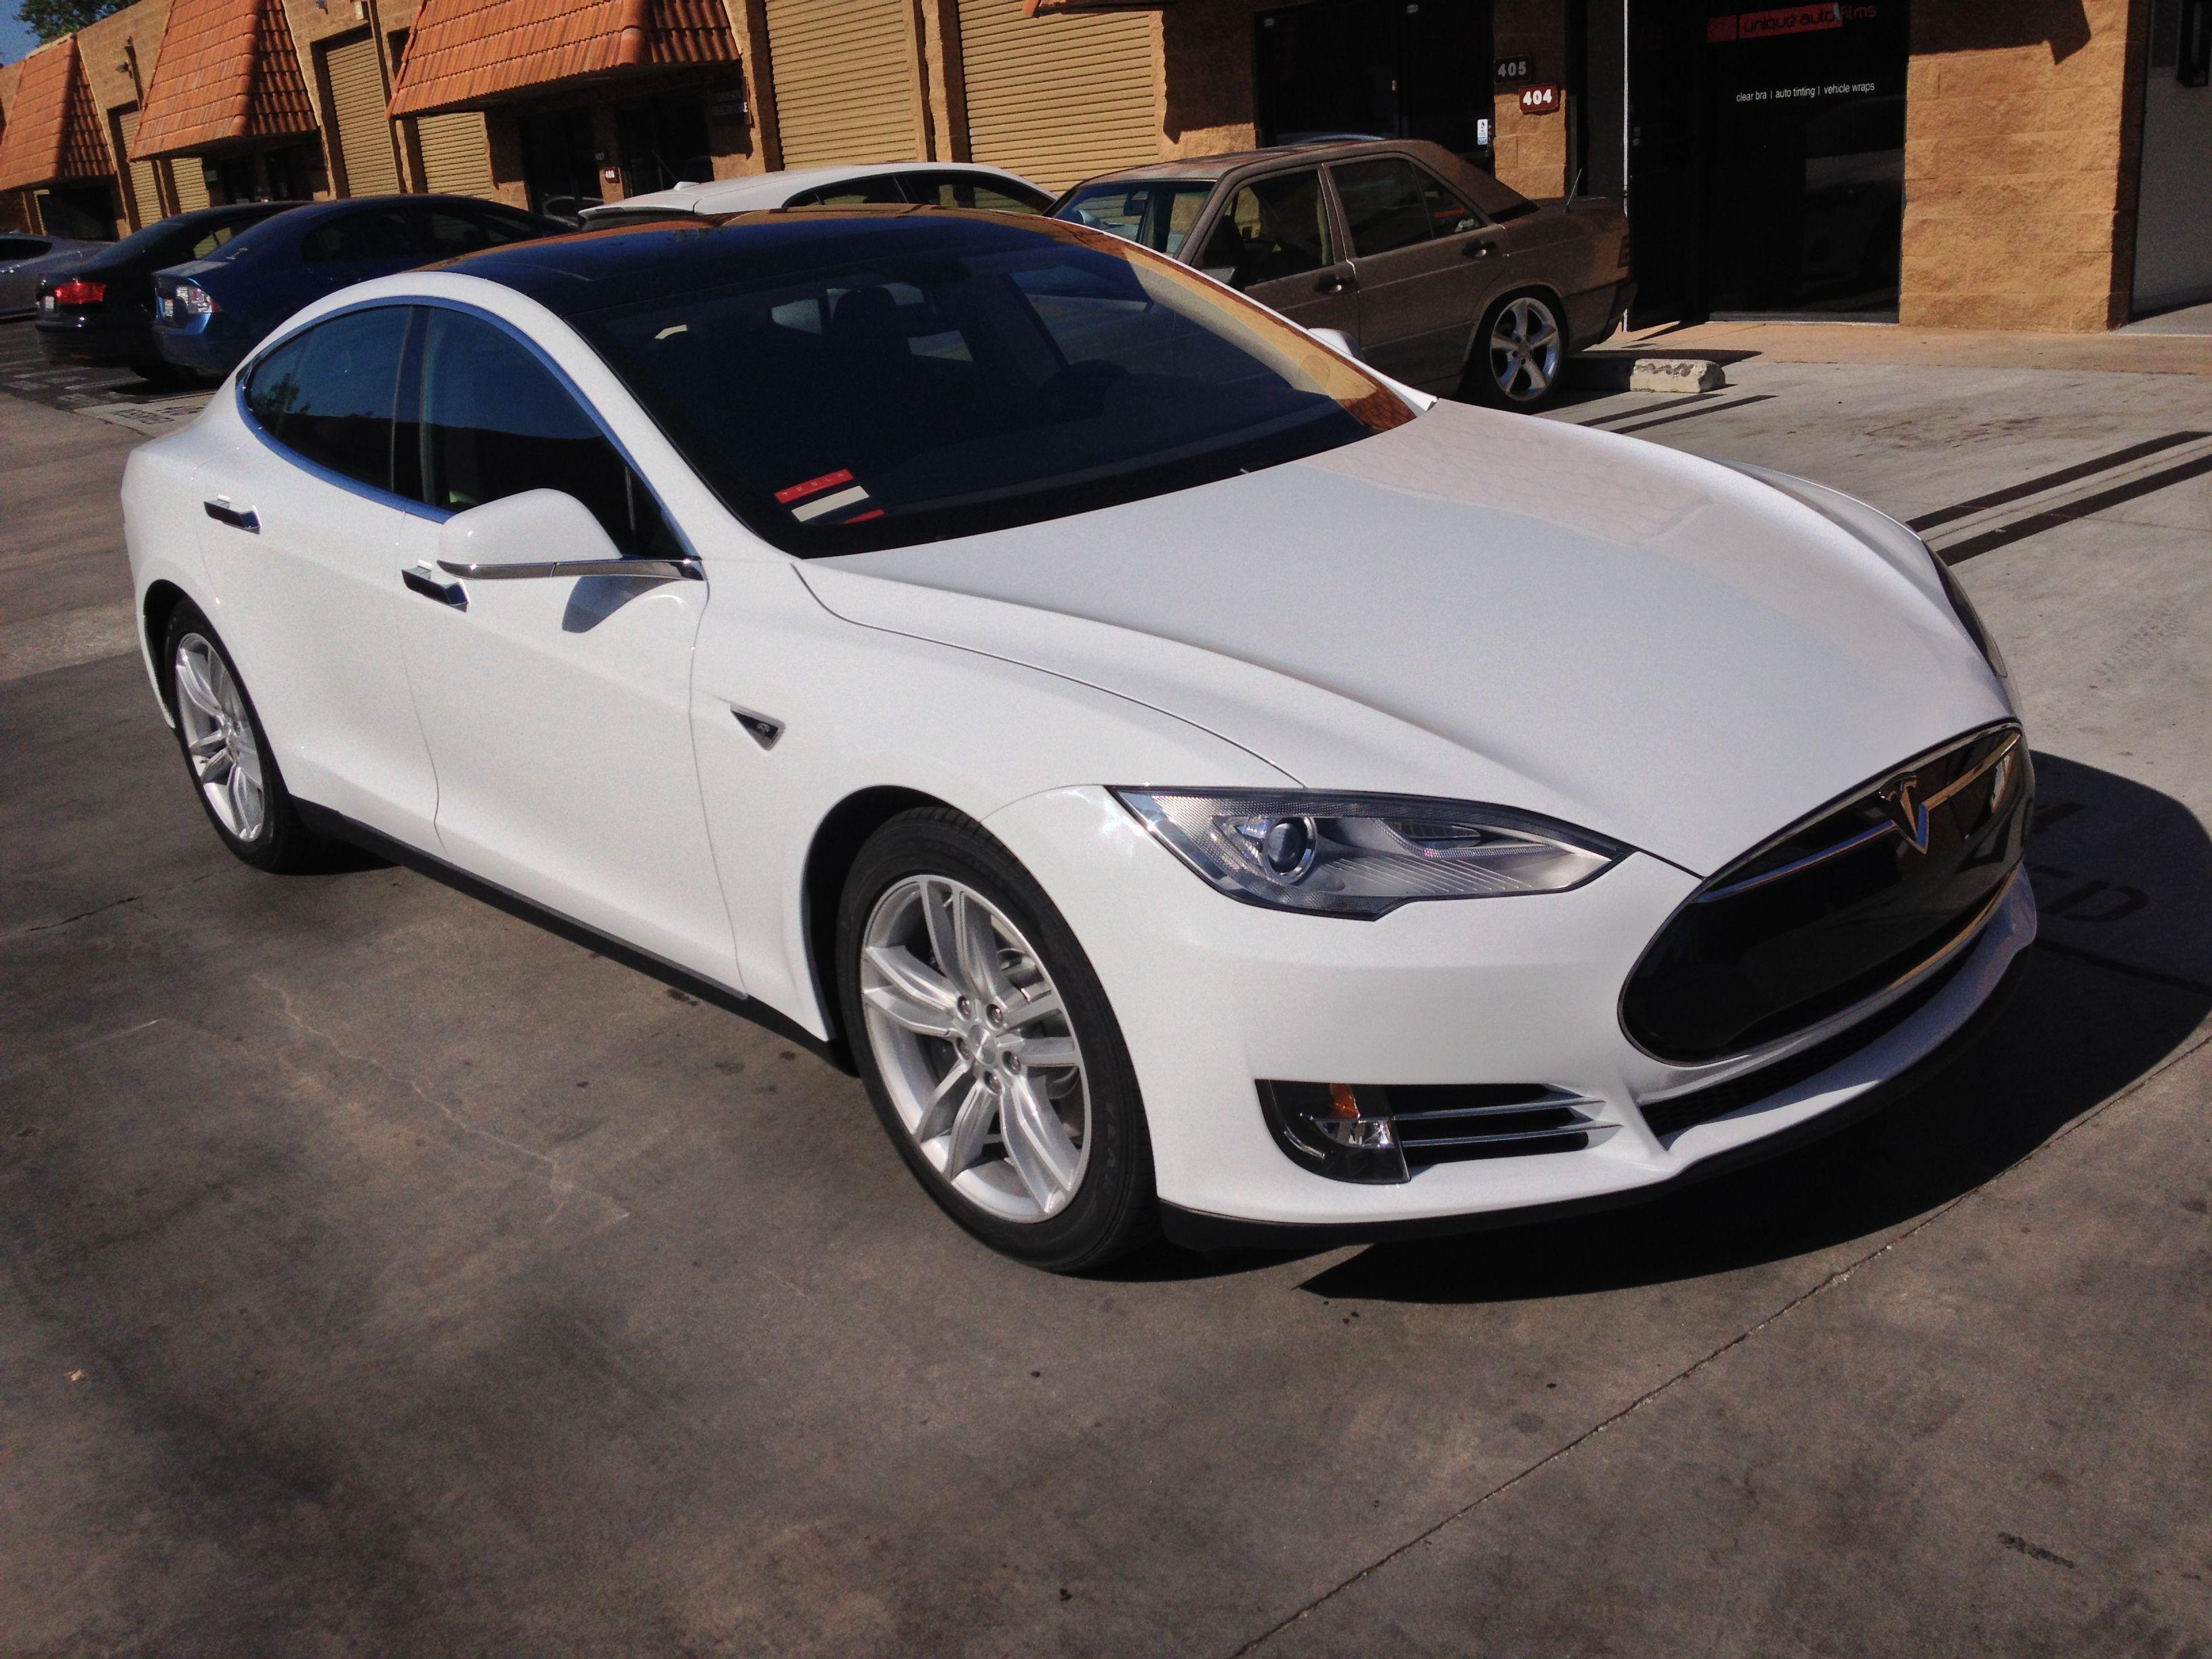 Tesla Model S New Electric Car Tesla Electric Car Tesla Model S Fuel Efficient Cars